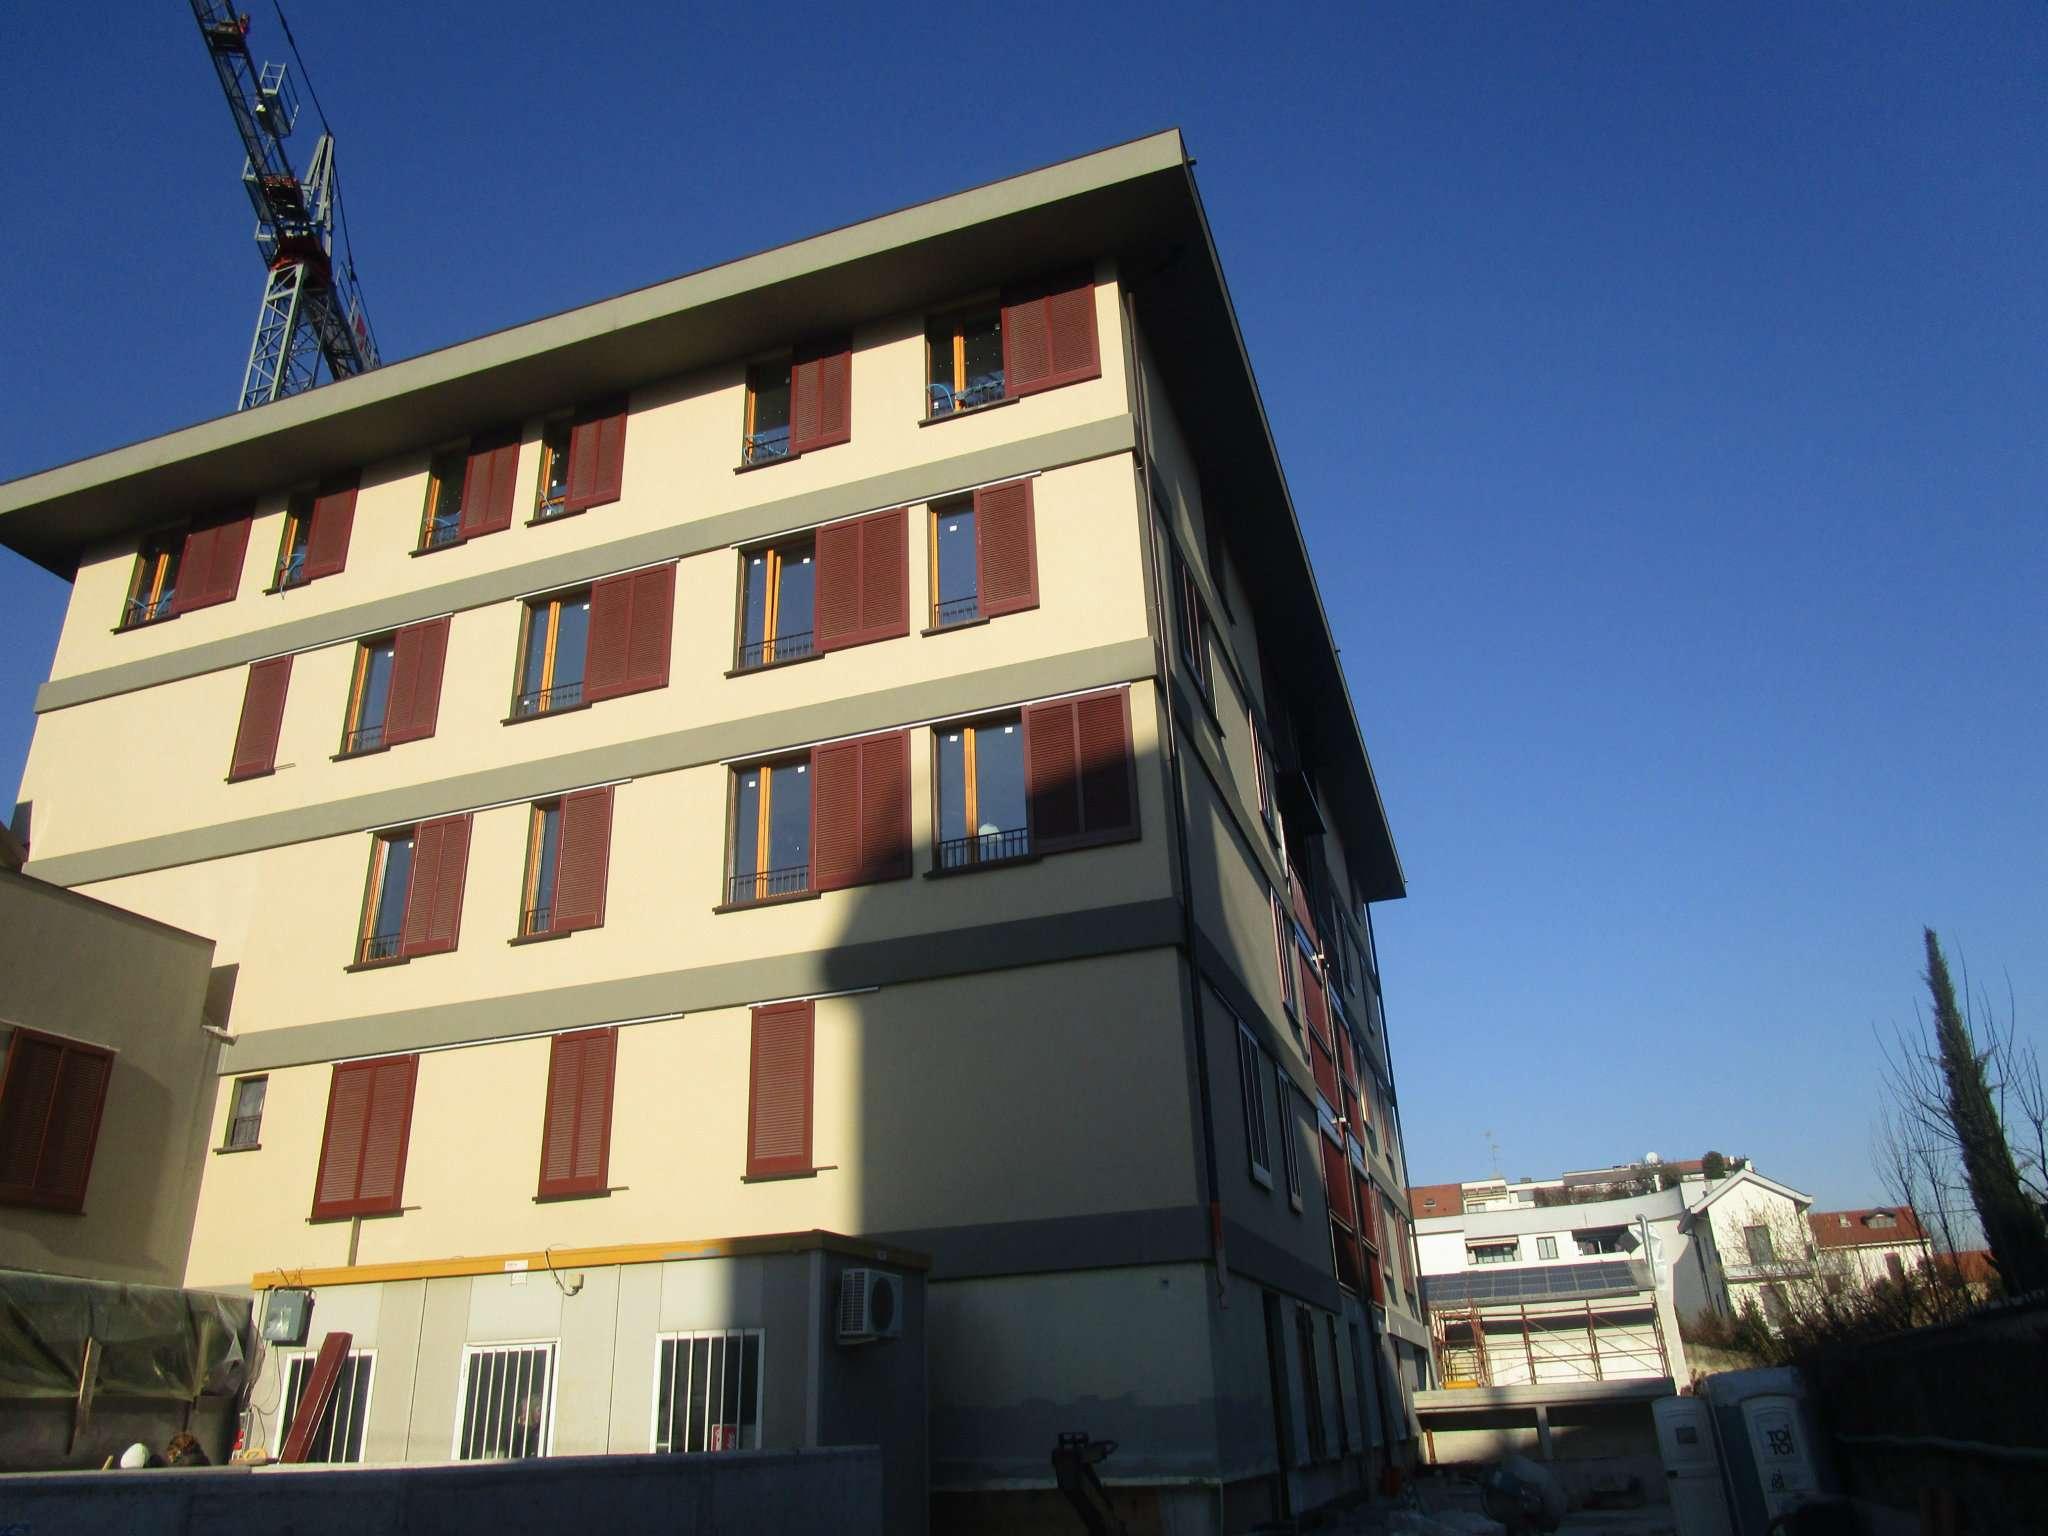 Bilocale Monza Via Oslavia 10